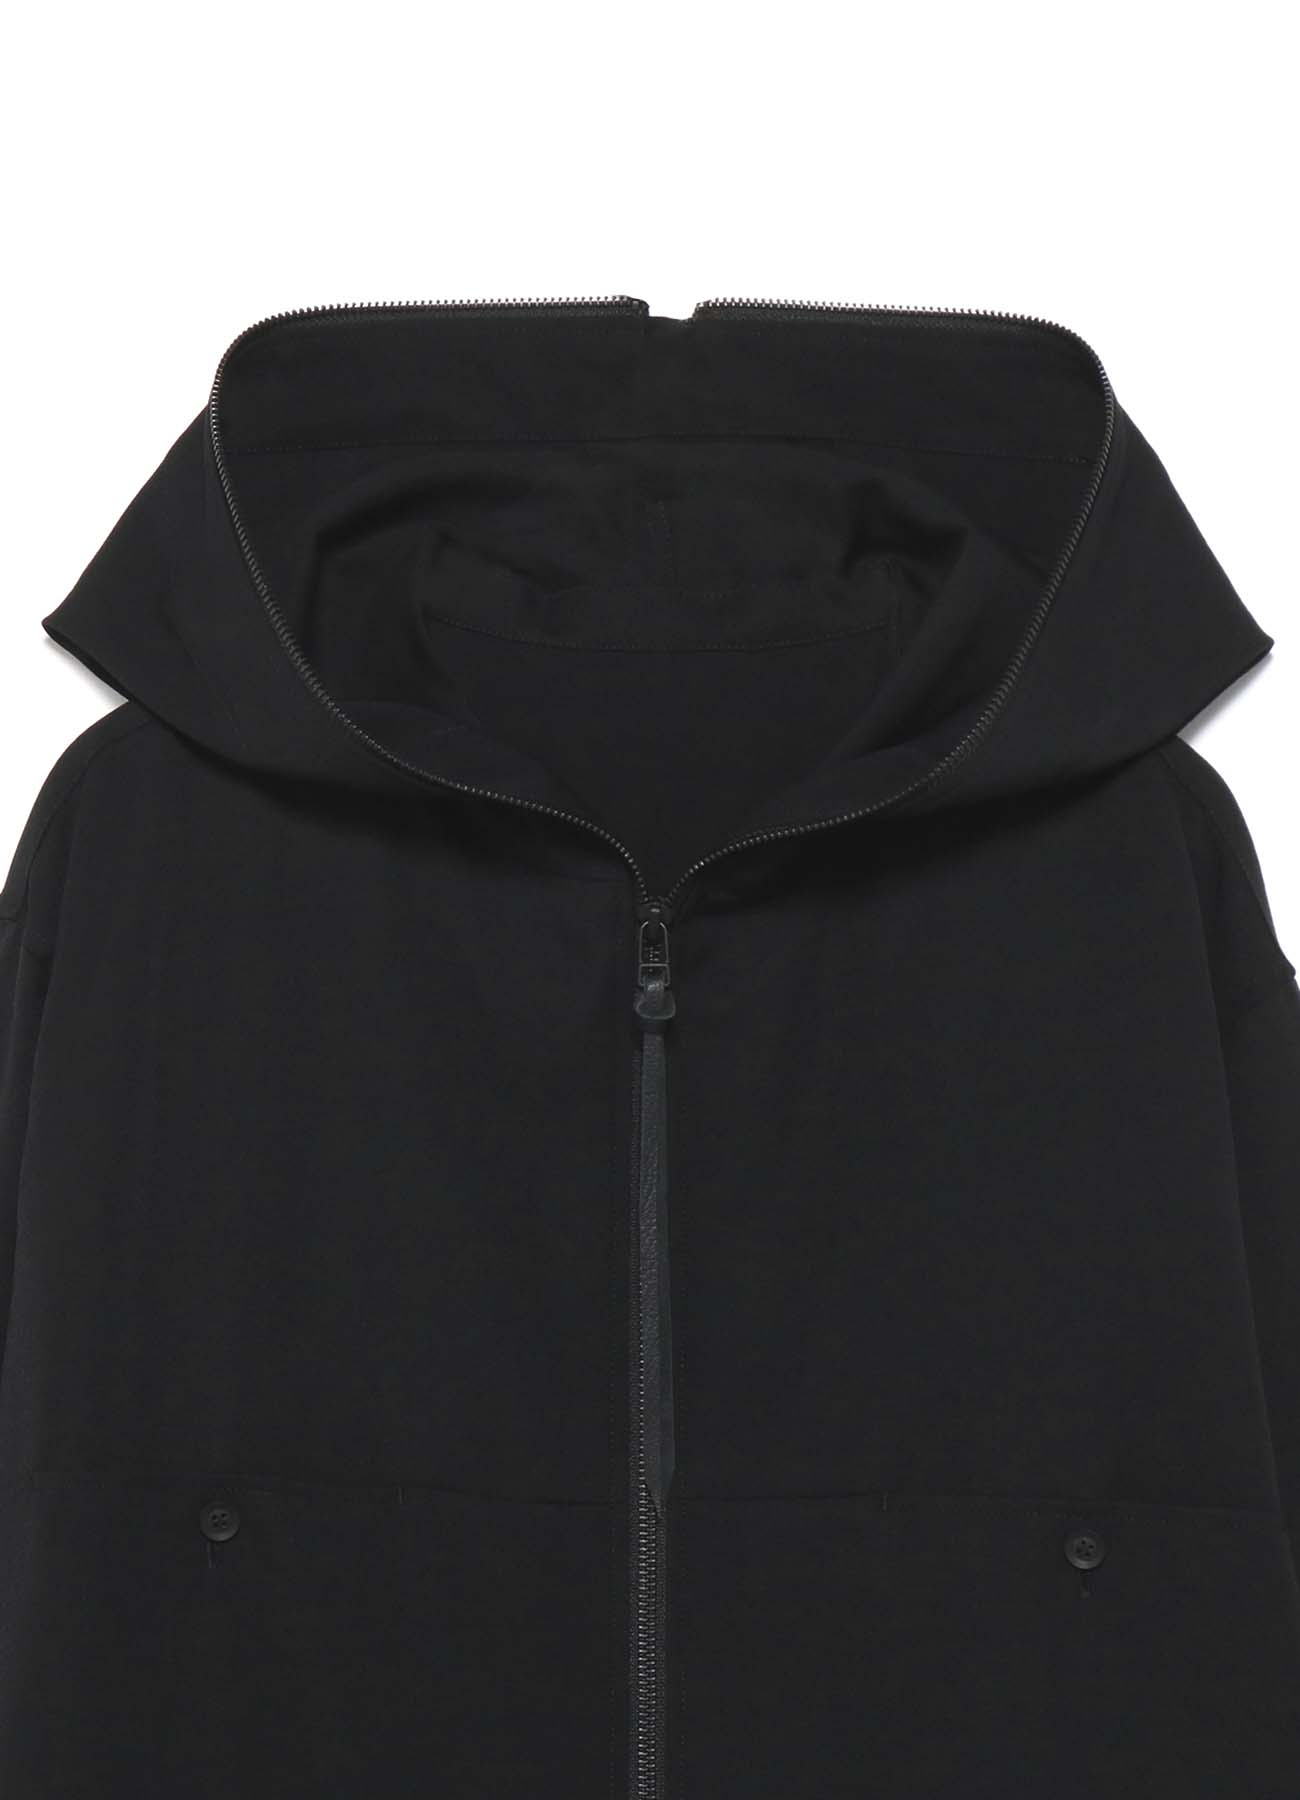 B/ Wool Gabardine fastener food shirt